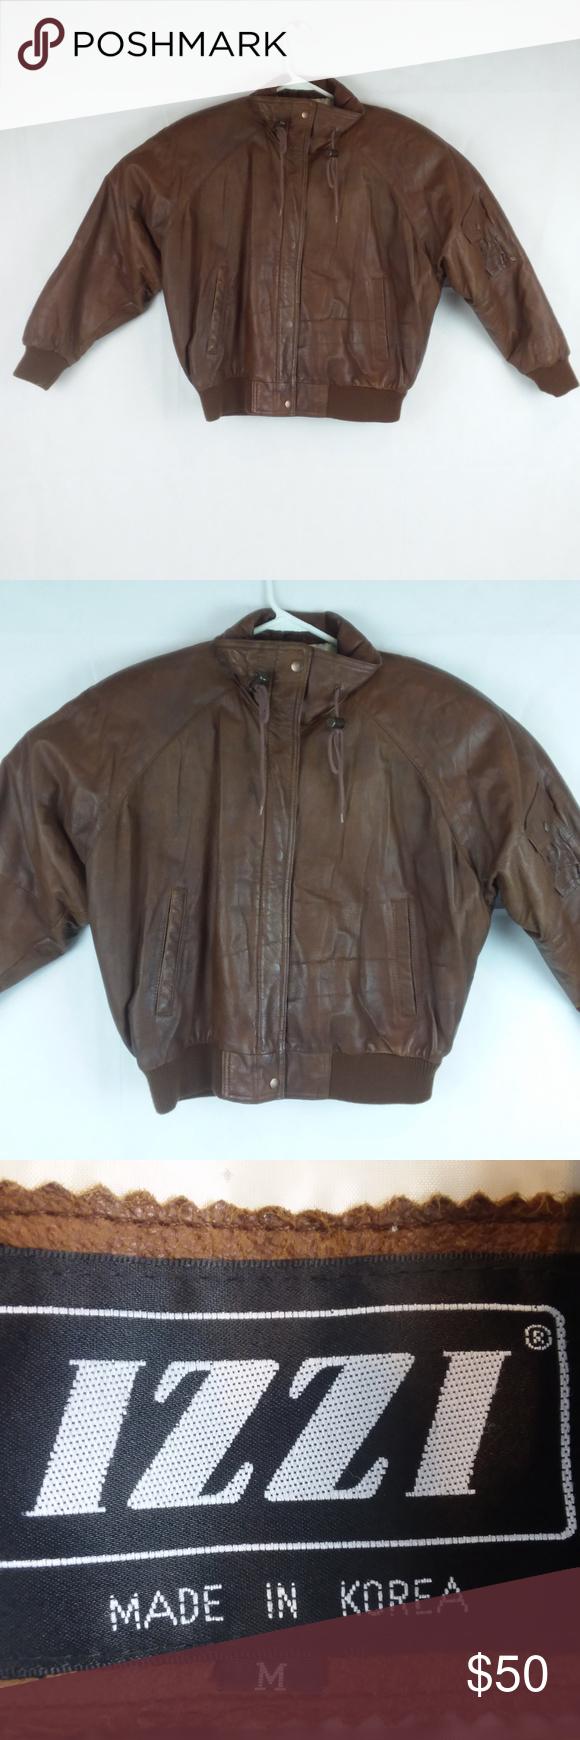 Izzi Women S Vintage Leather Bomber Jacket Leather Bomber Jacket Leather Bomber Vintage Leather [ 1740 x 580 Pixel ]